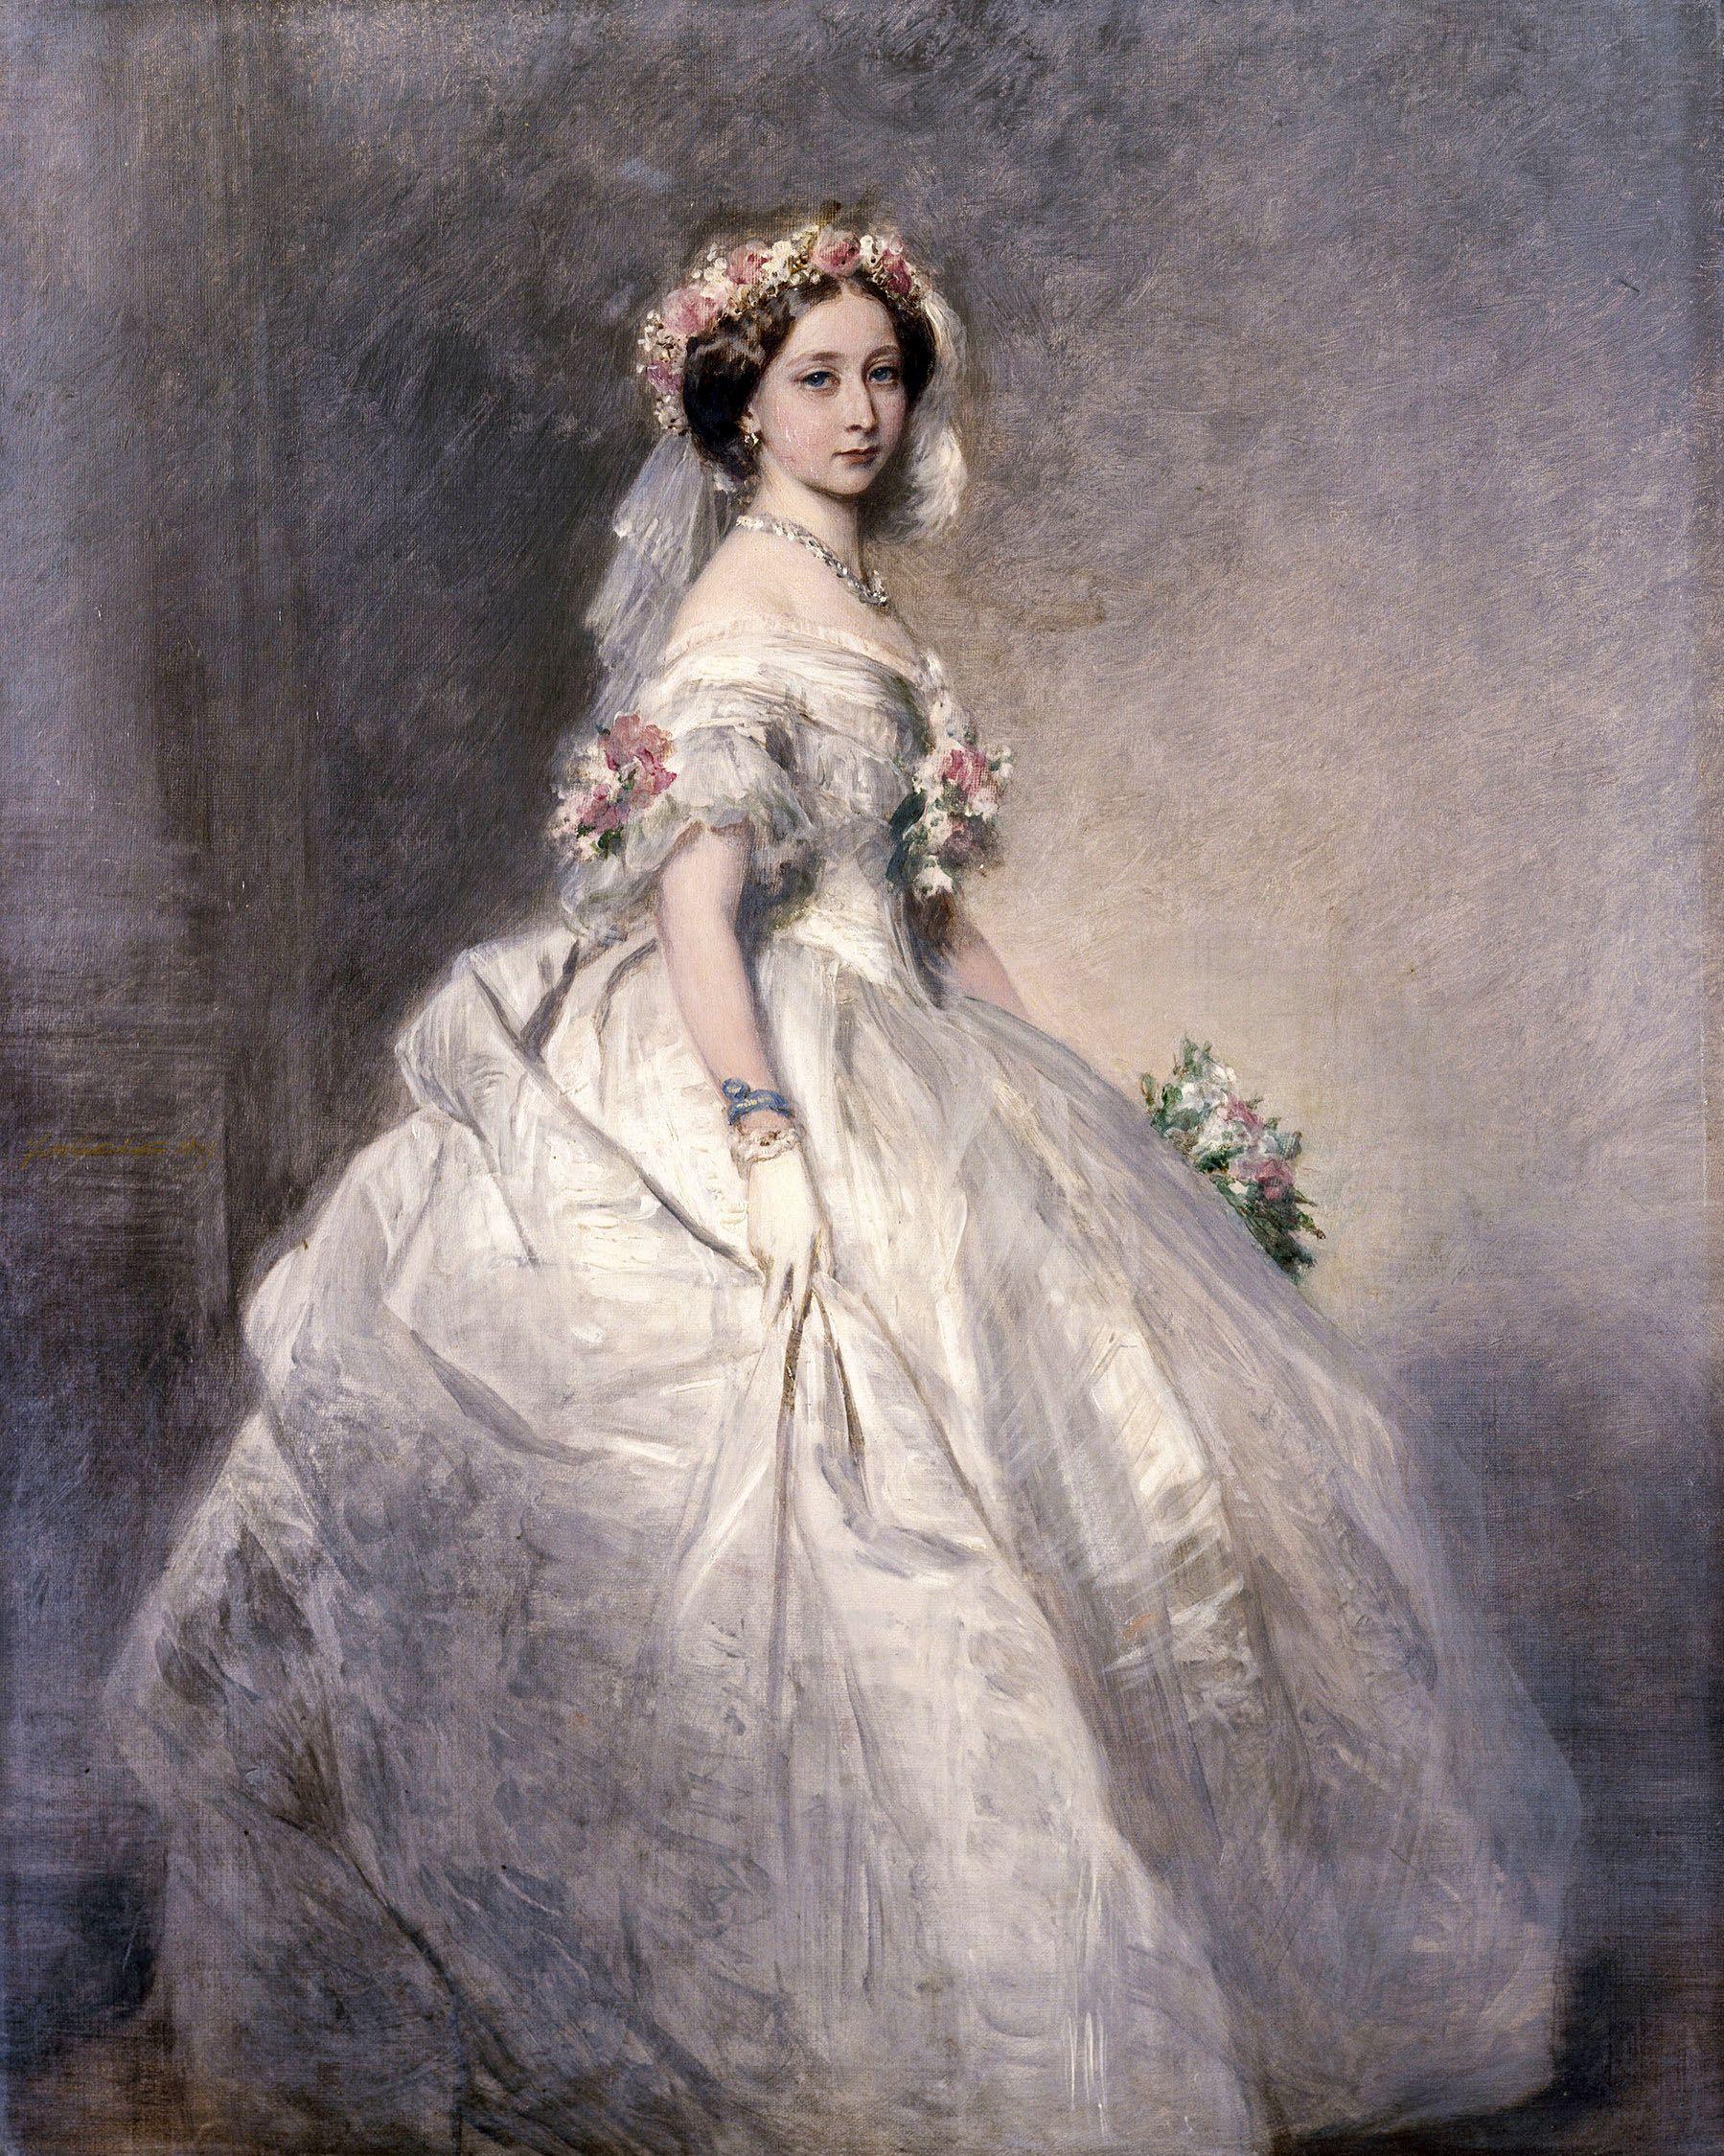 Pin By Marco Antonio On Arte Antiga Princess Alice Queen Victoria Family Queen Victoria [ 2250 x 1799 Pixel ]